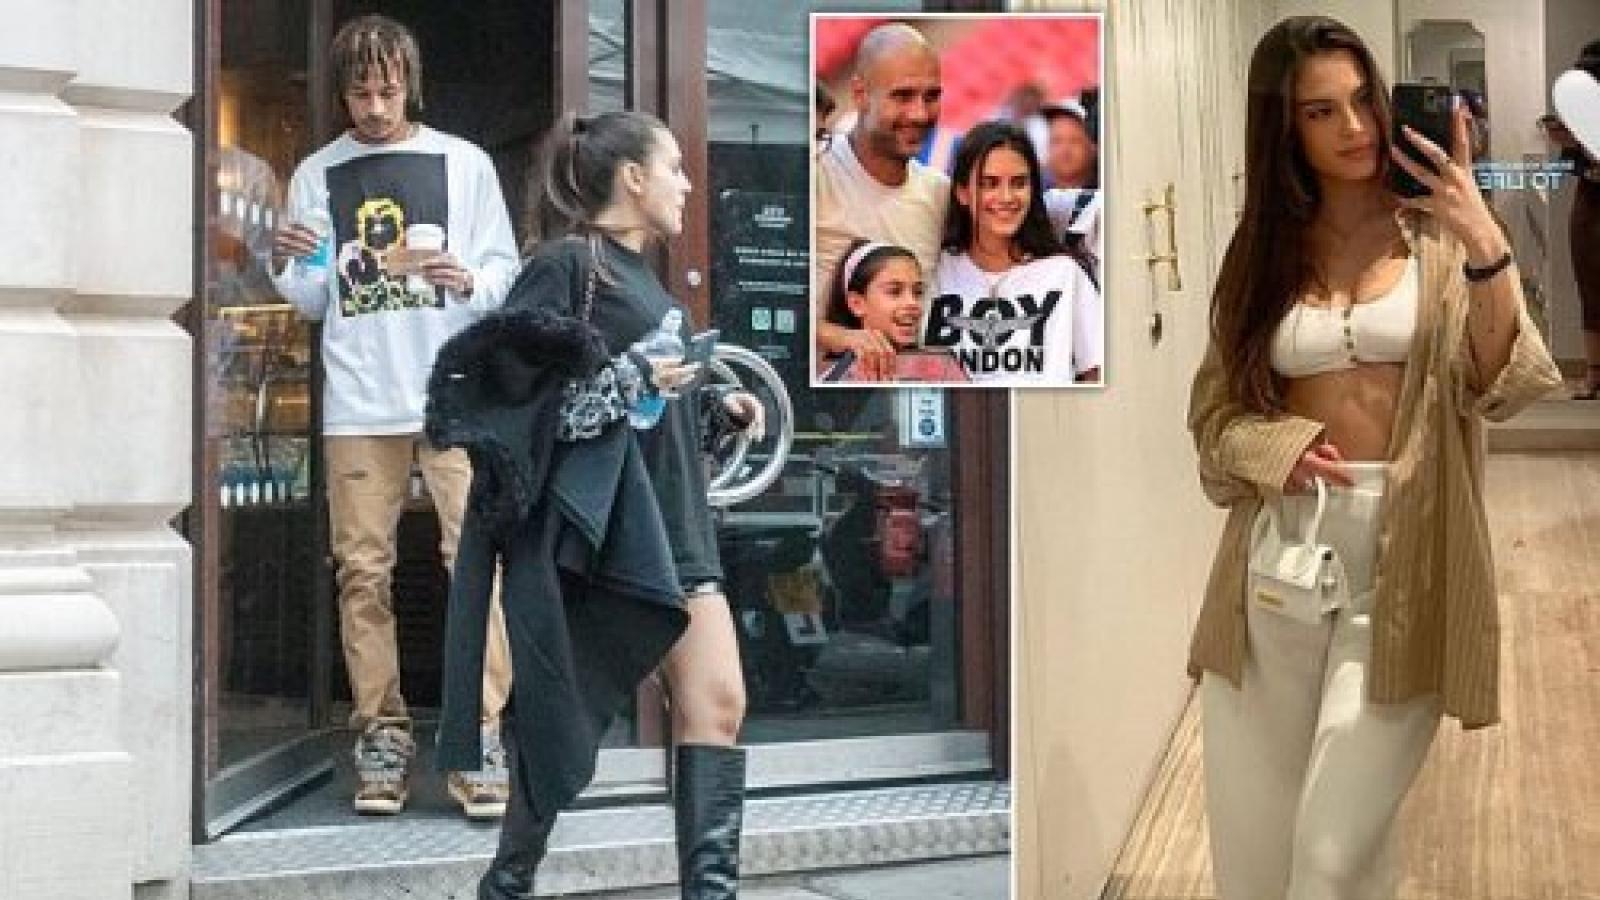 Premier League tạm nghỉ, Dele Alli đi hẹn hò với con gái Pep Guardiola